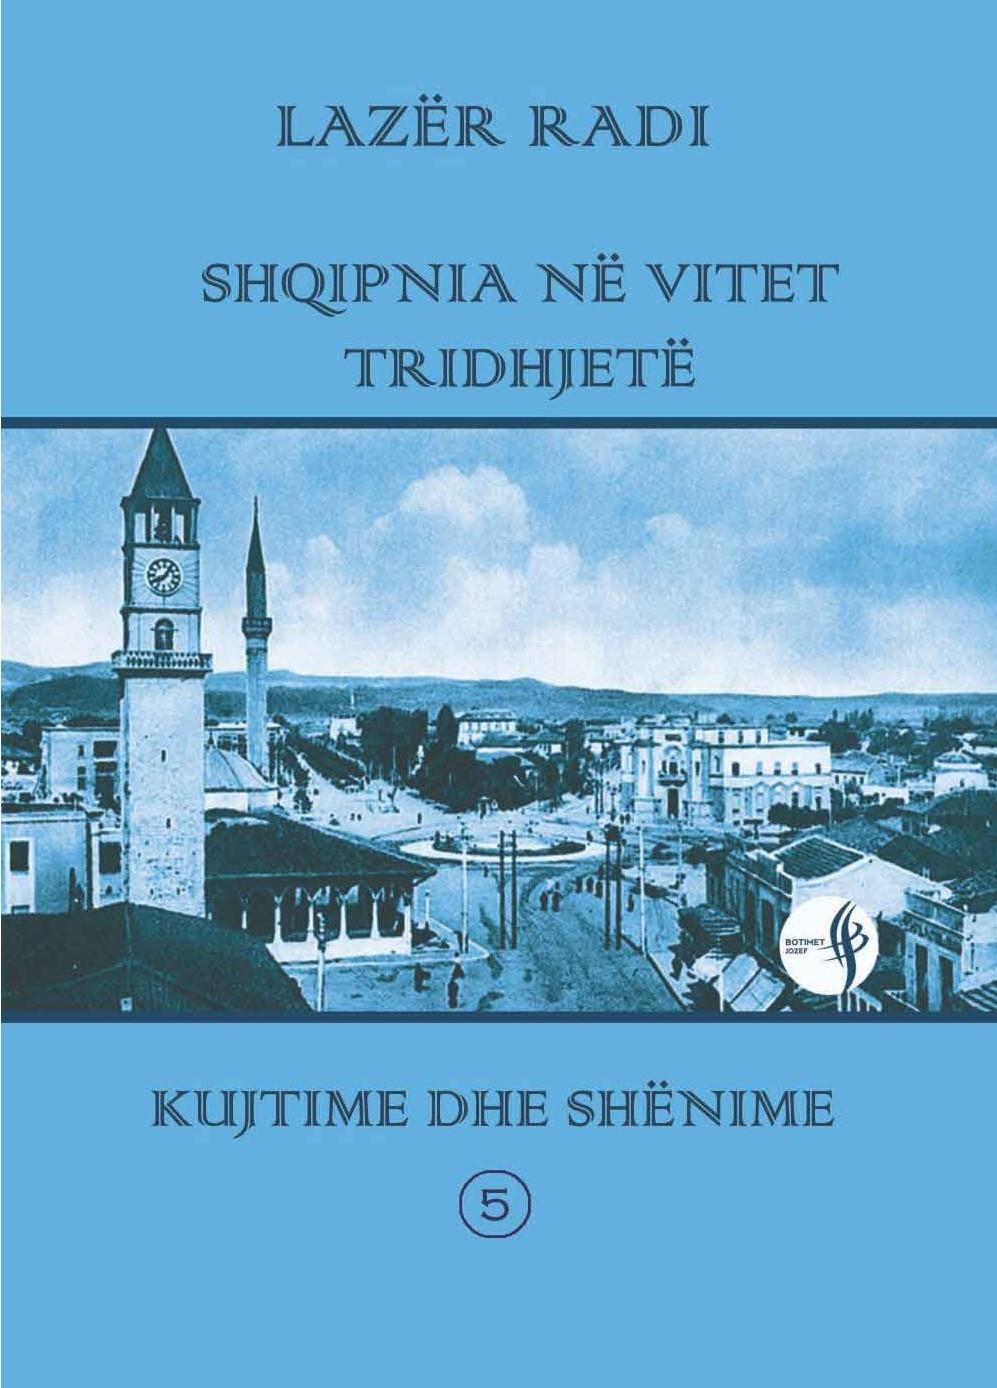 Shqipnia ne vitet tridhjete